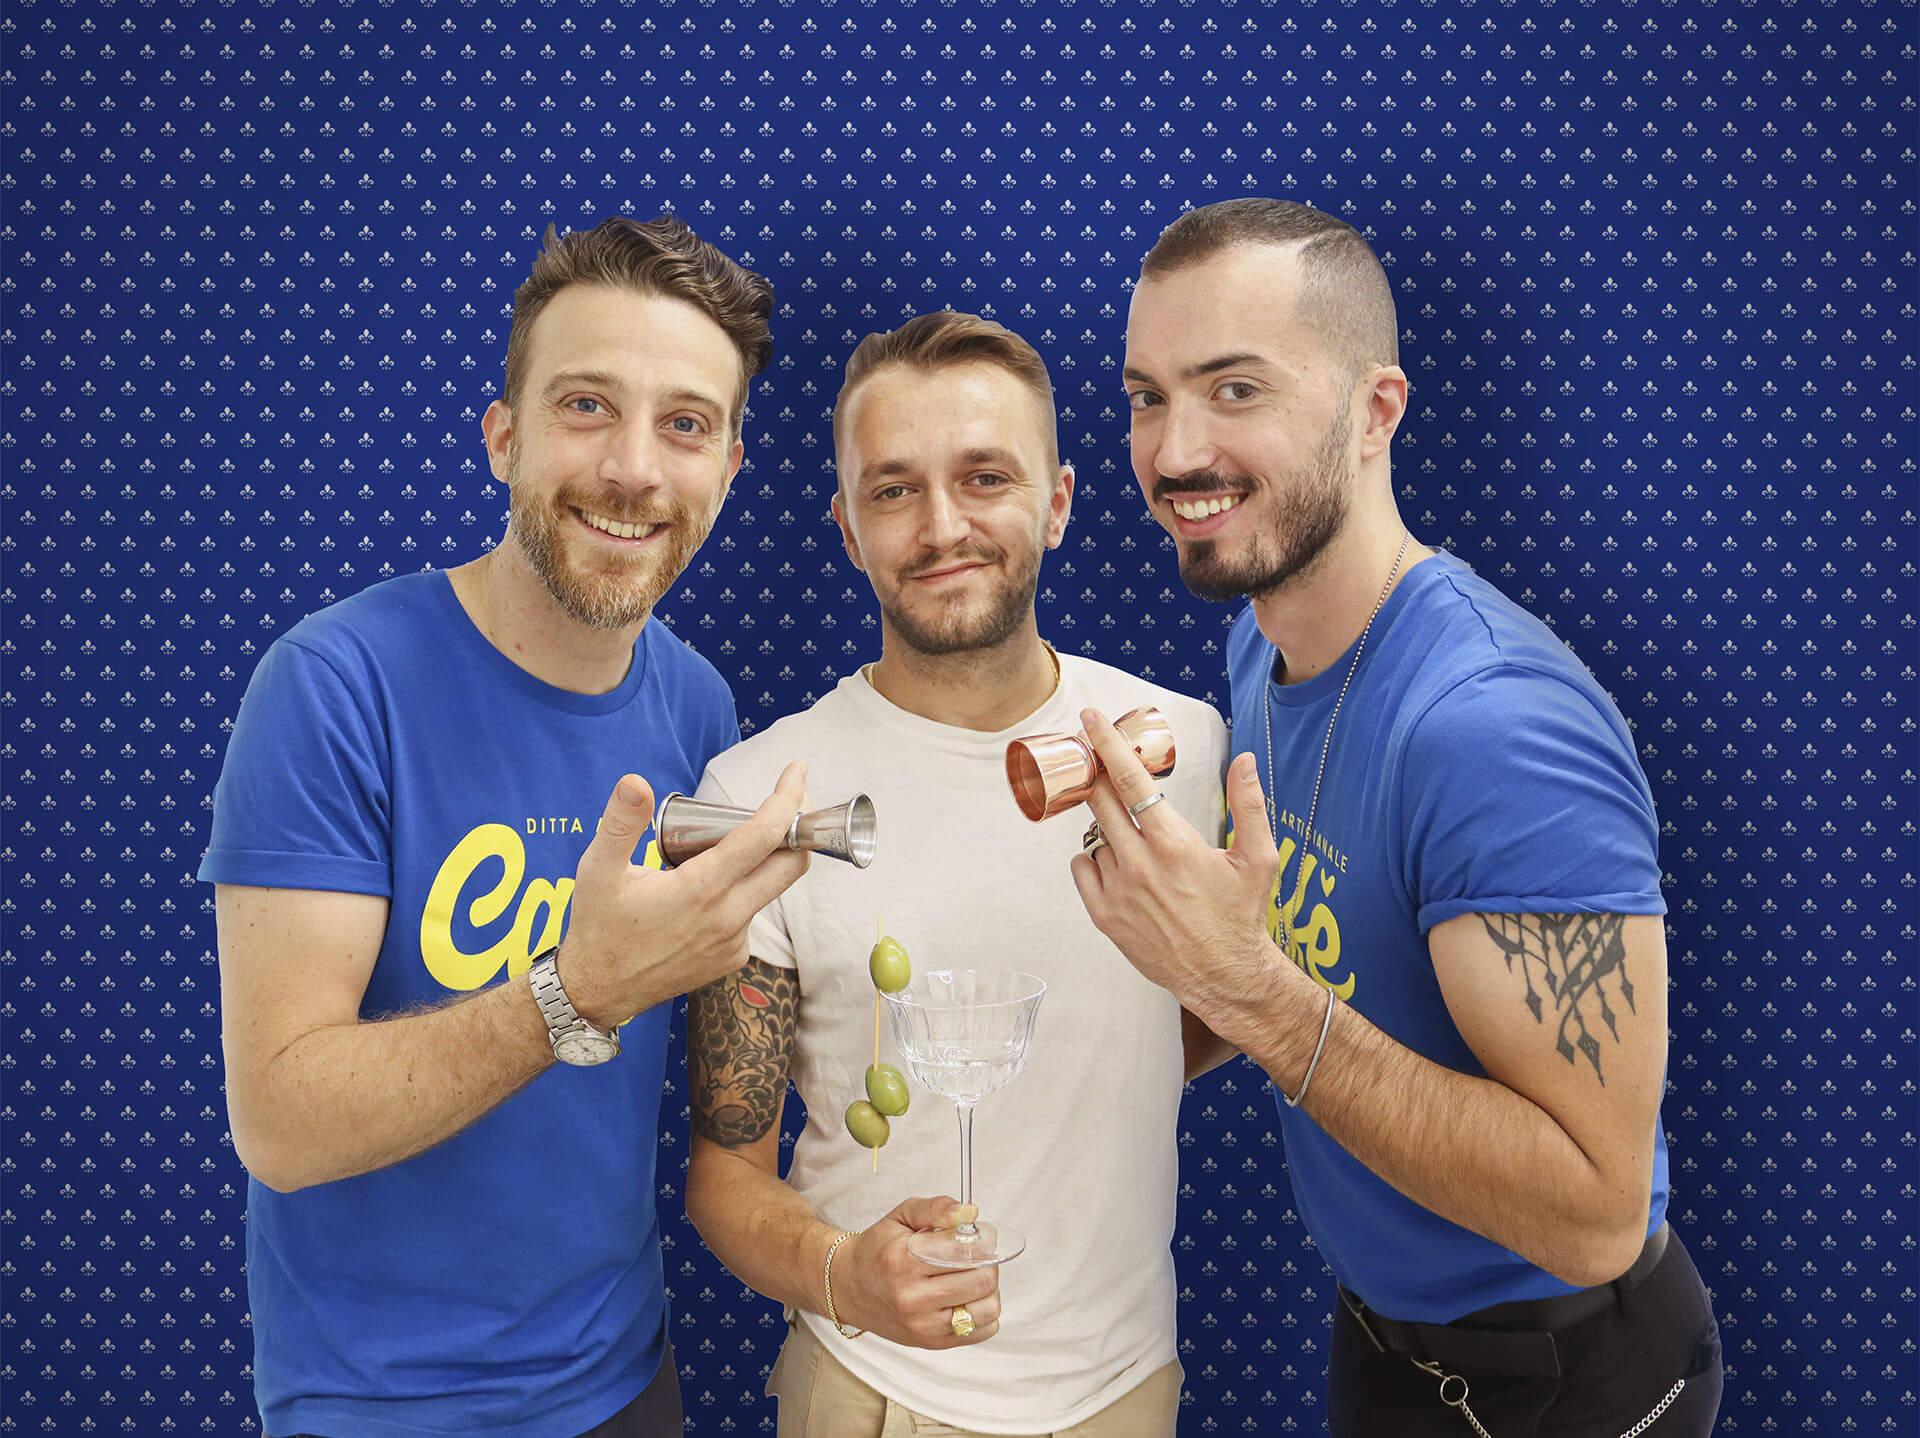 Ledion Prenga, Matteo Papini e Emanuele Ventura  - Ditta Artigianale Sant'Ambrogio